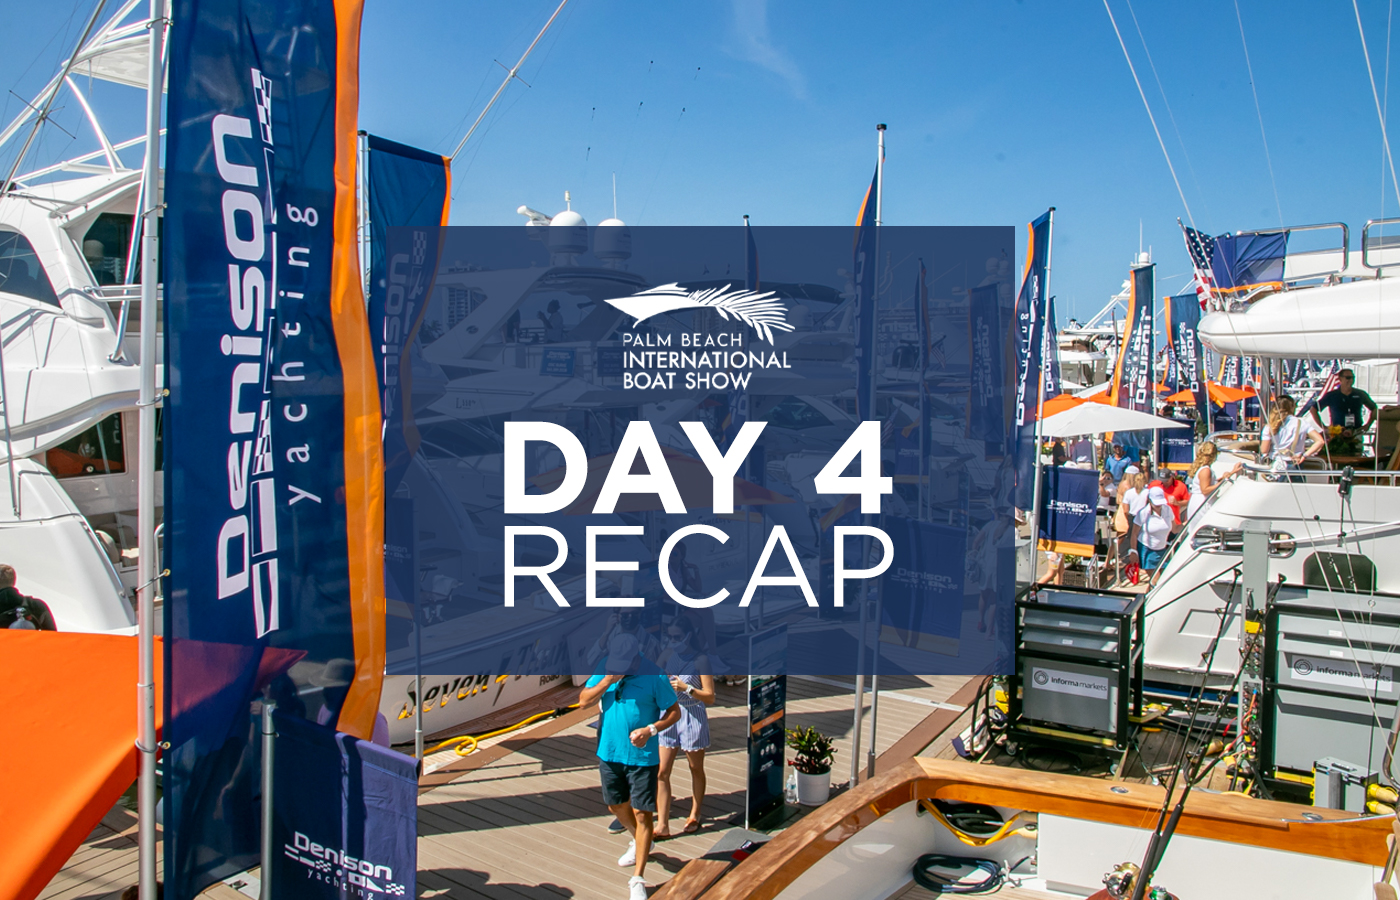 Palm Beach Boat Show 2021 Day 4 Recap